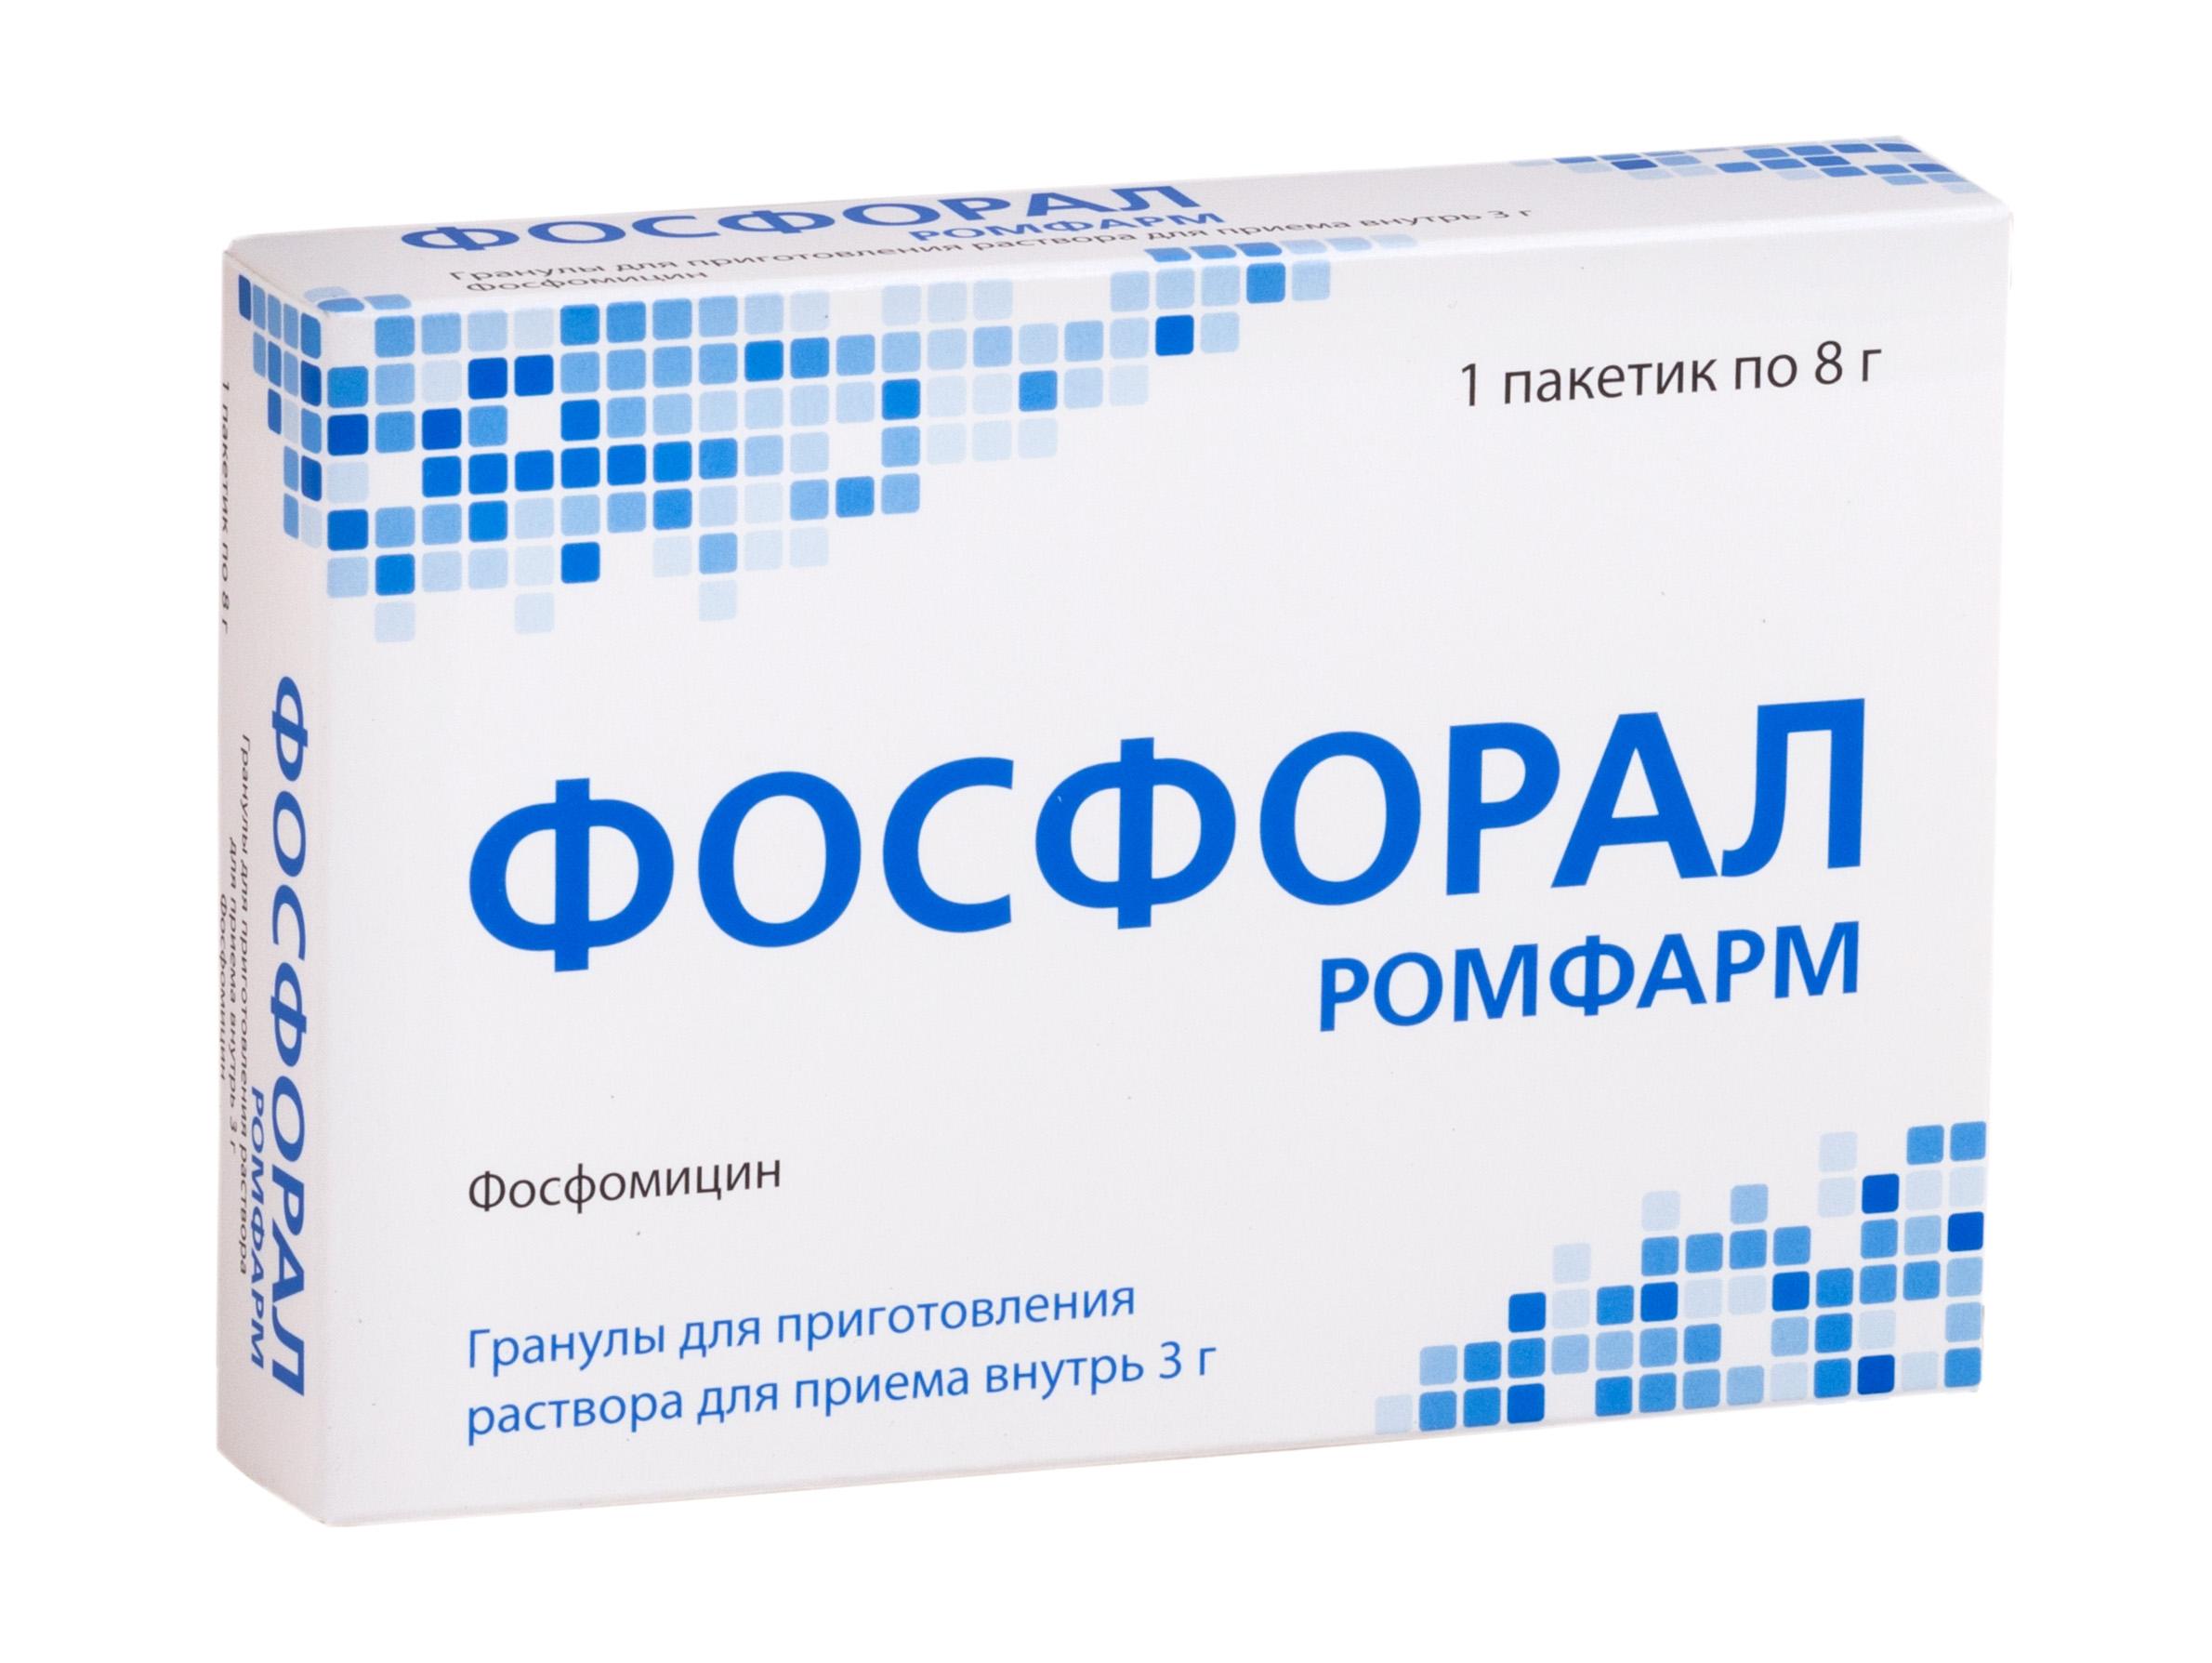 Фосфорал ромфарм гран. д/приема внутрь 3г пакет 8г n1